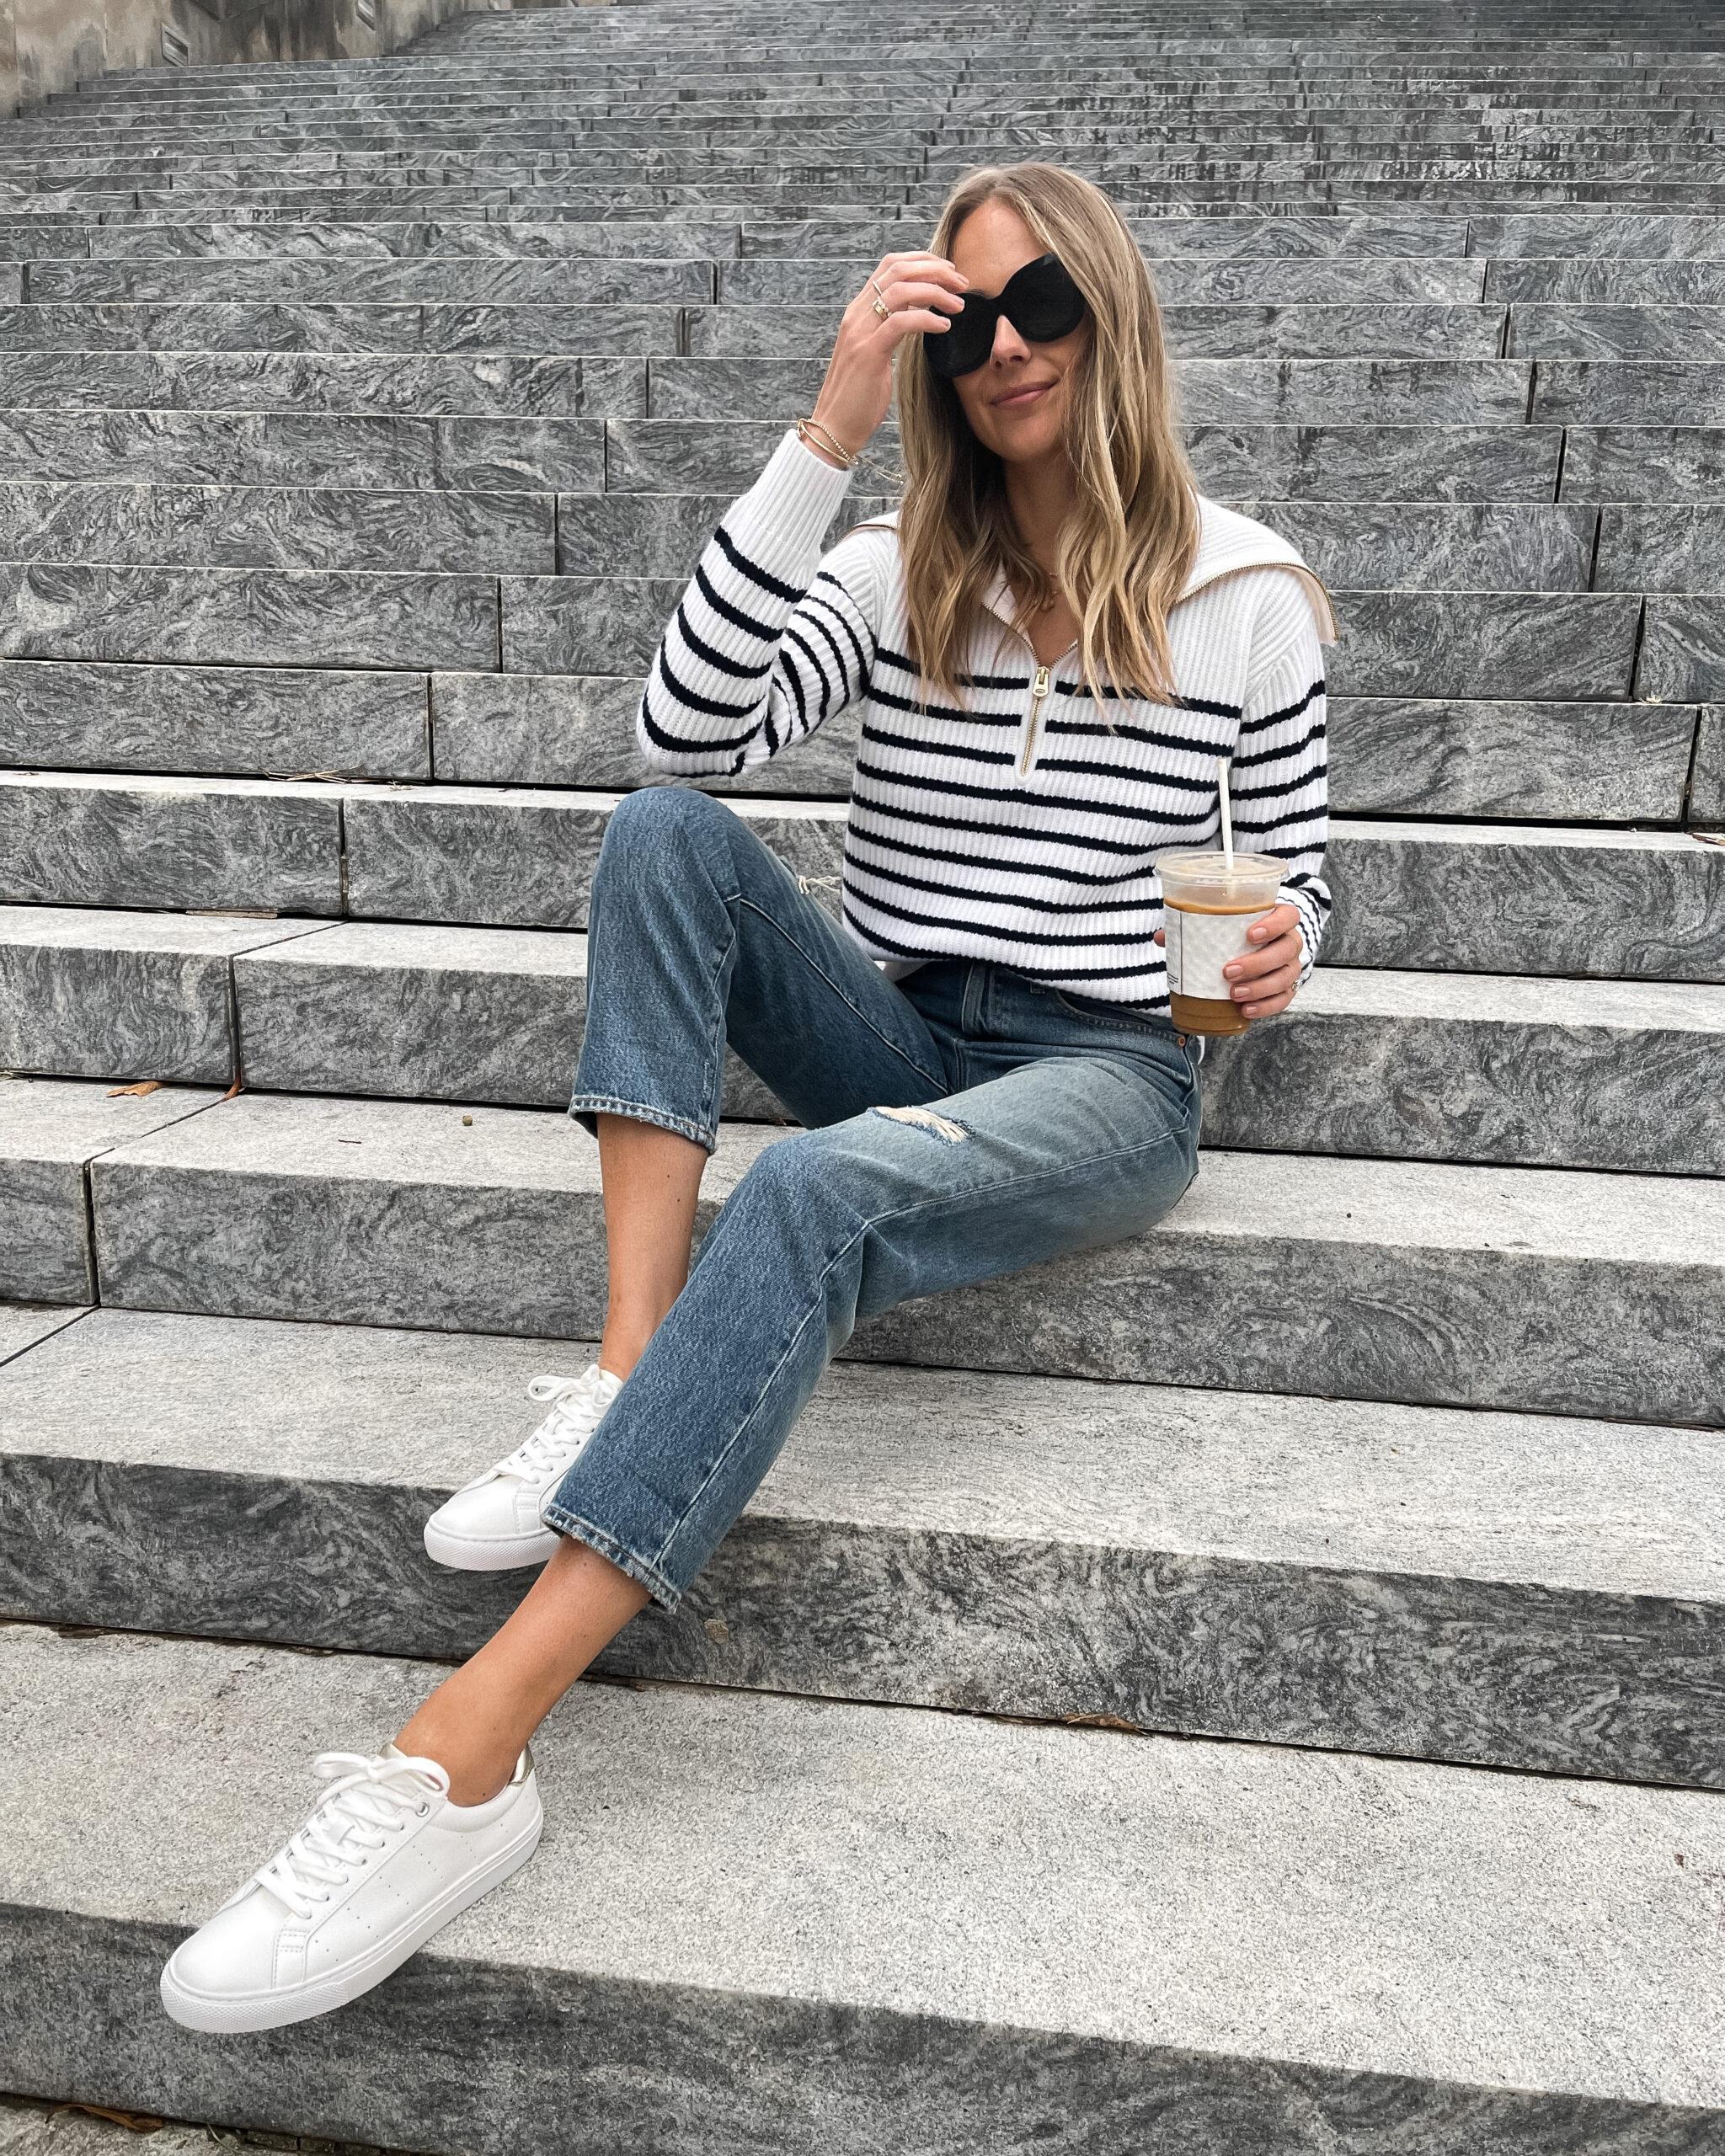 Fashion Jackson Wearing Jcrew White Navy Striped Sweater Ripped Jeans White Sneakers